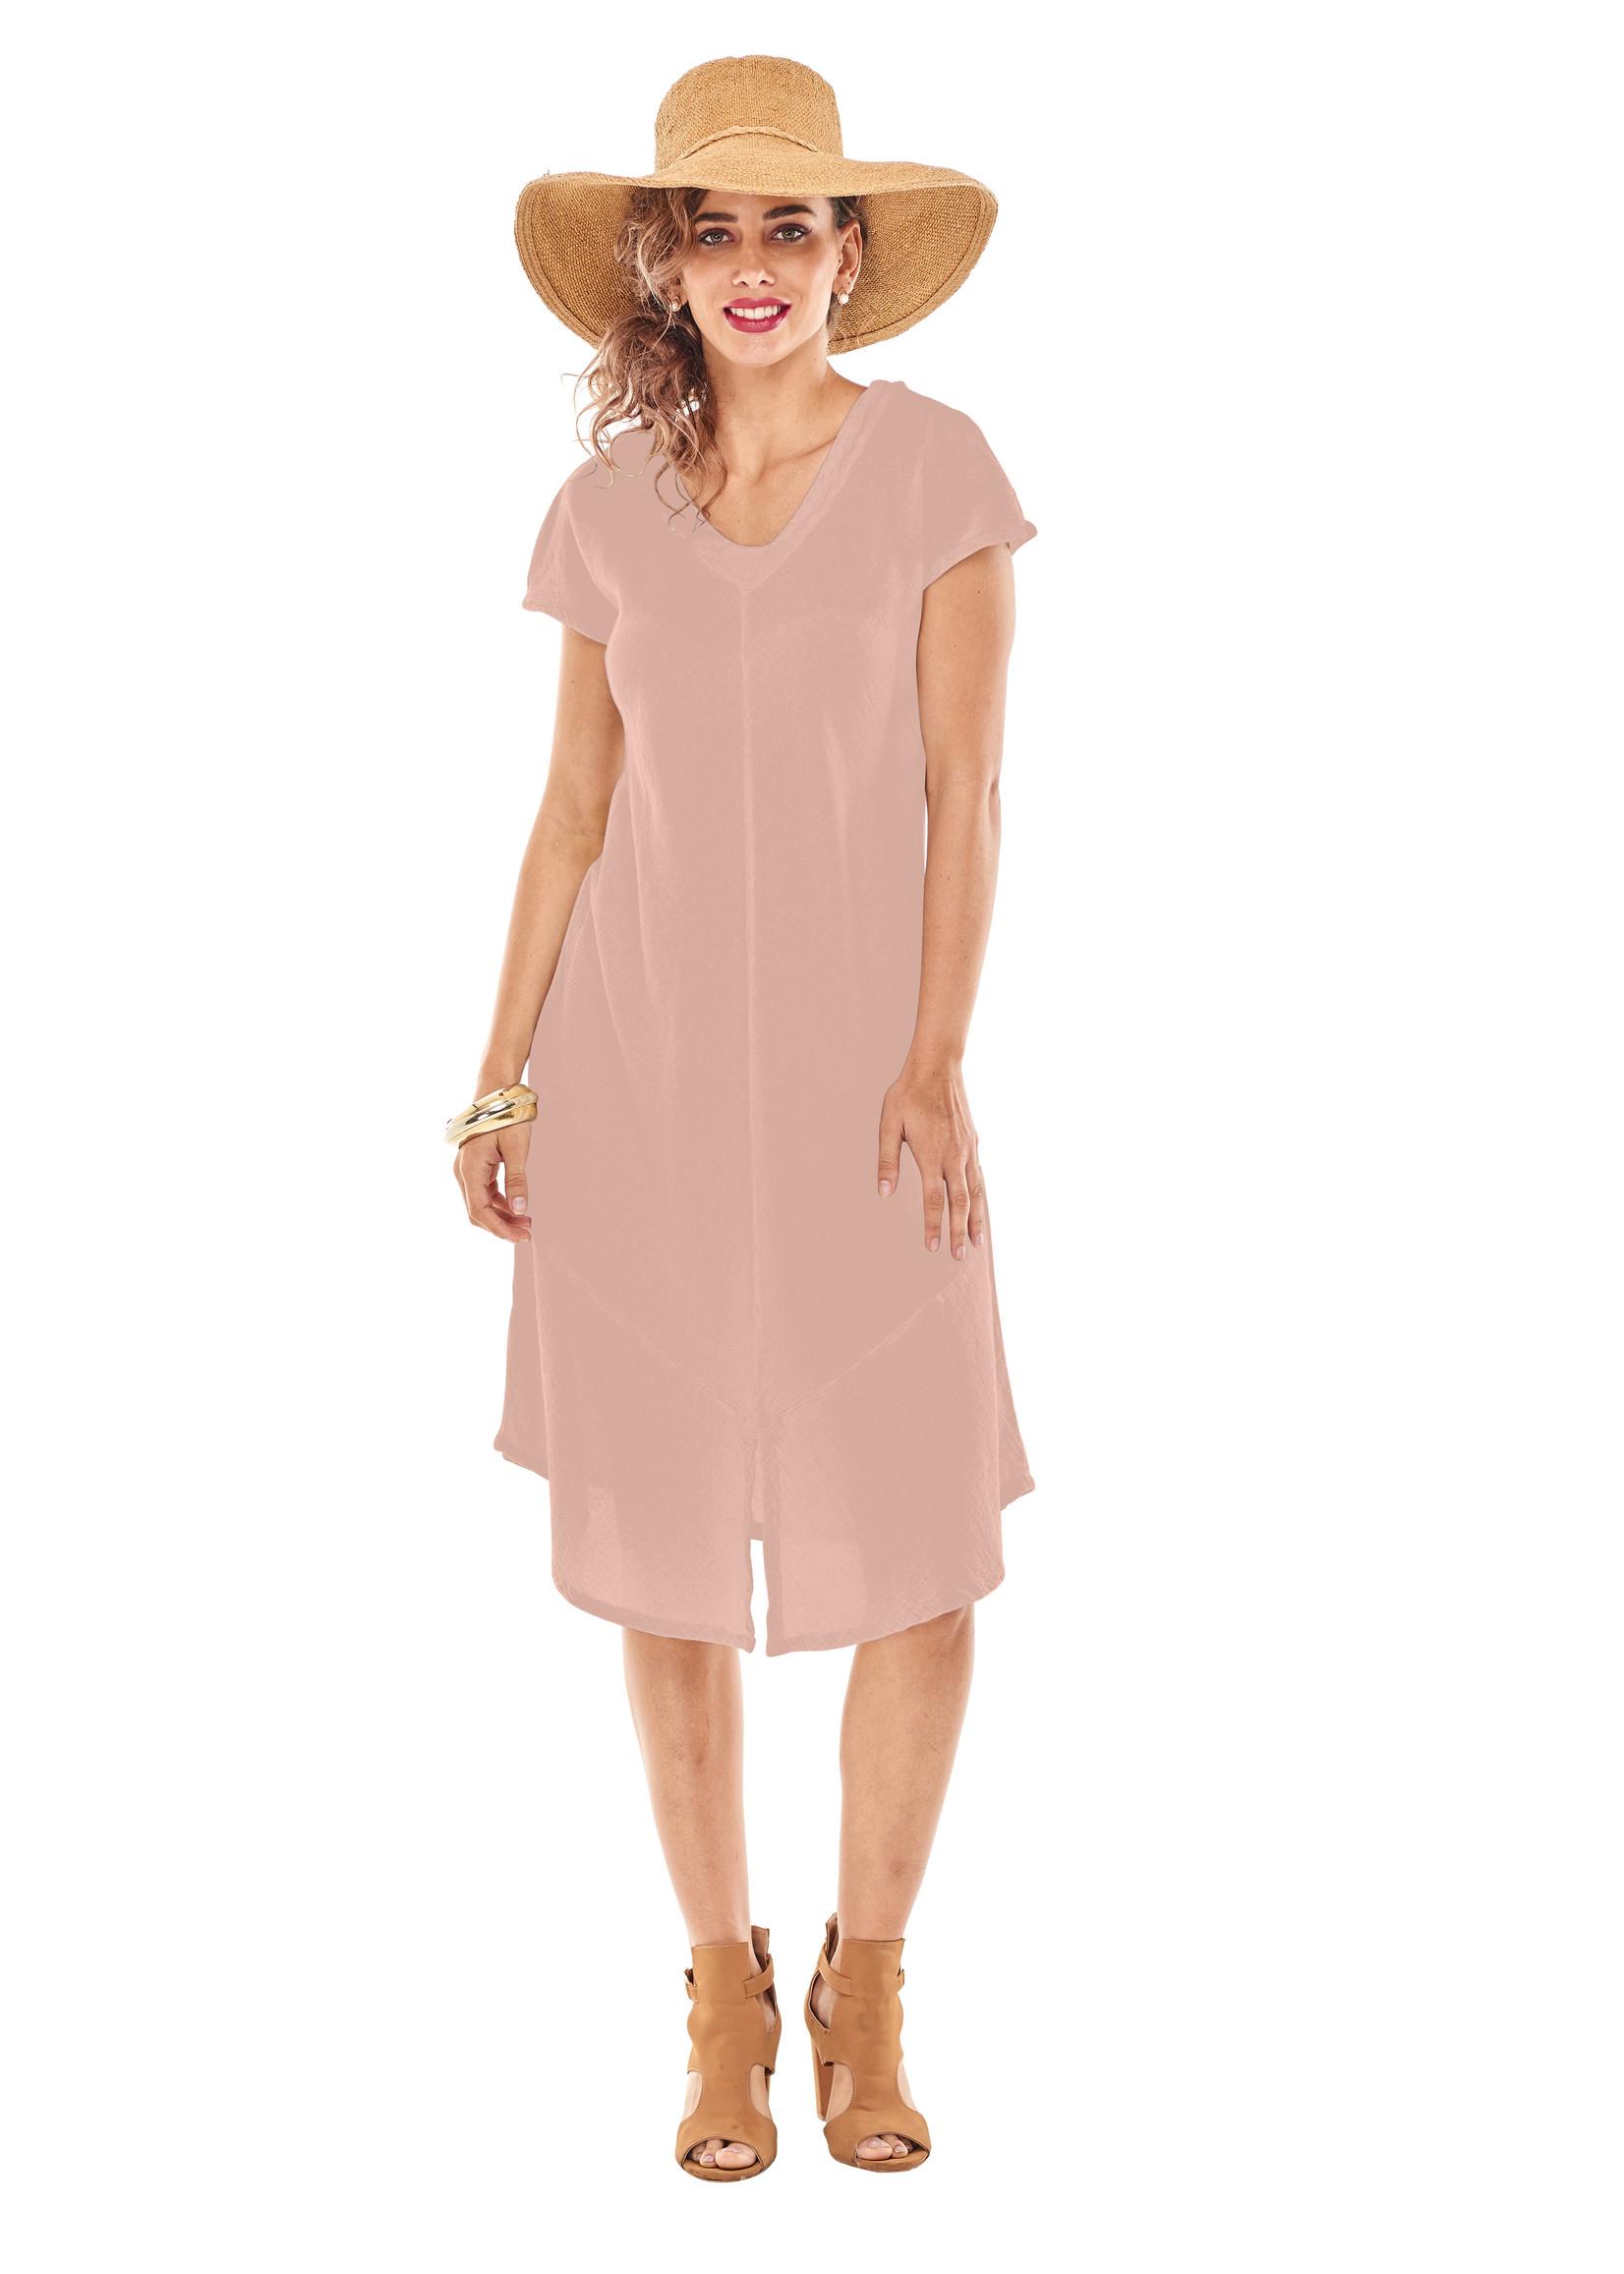 Oh My Gauze! Kaley Cotton Dress